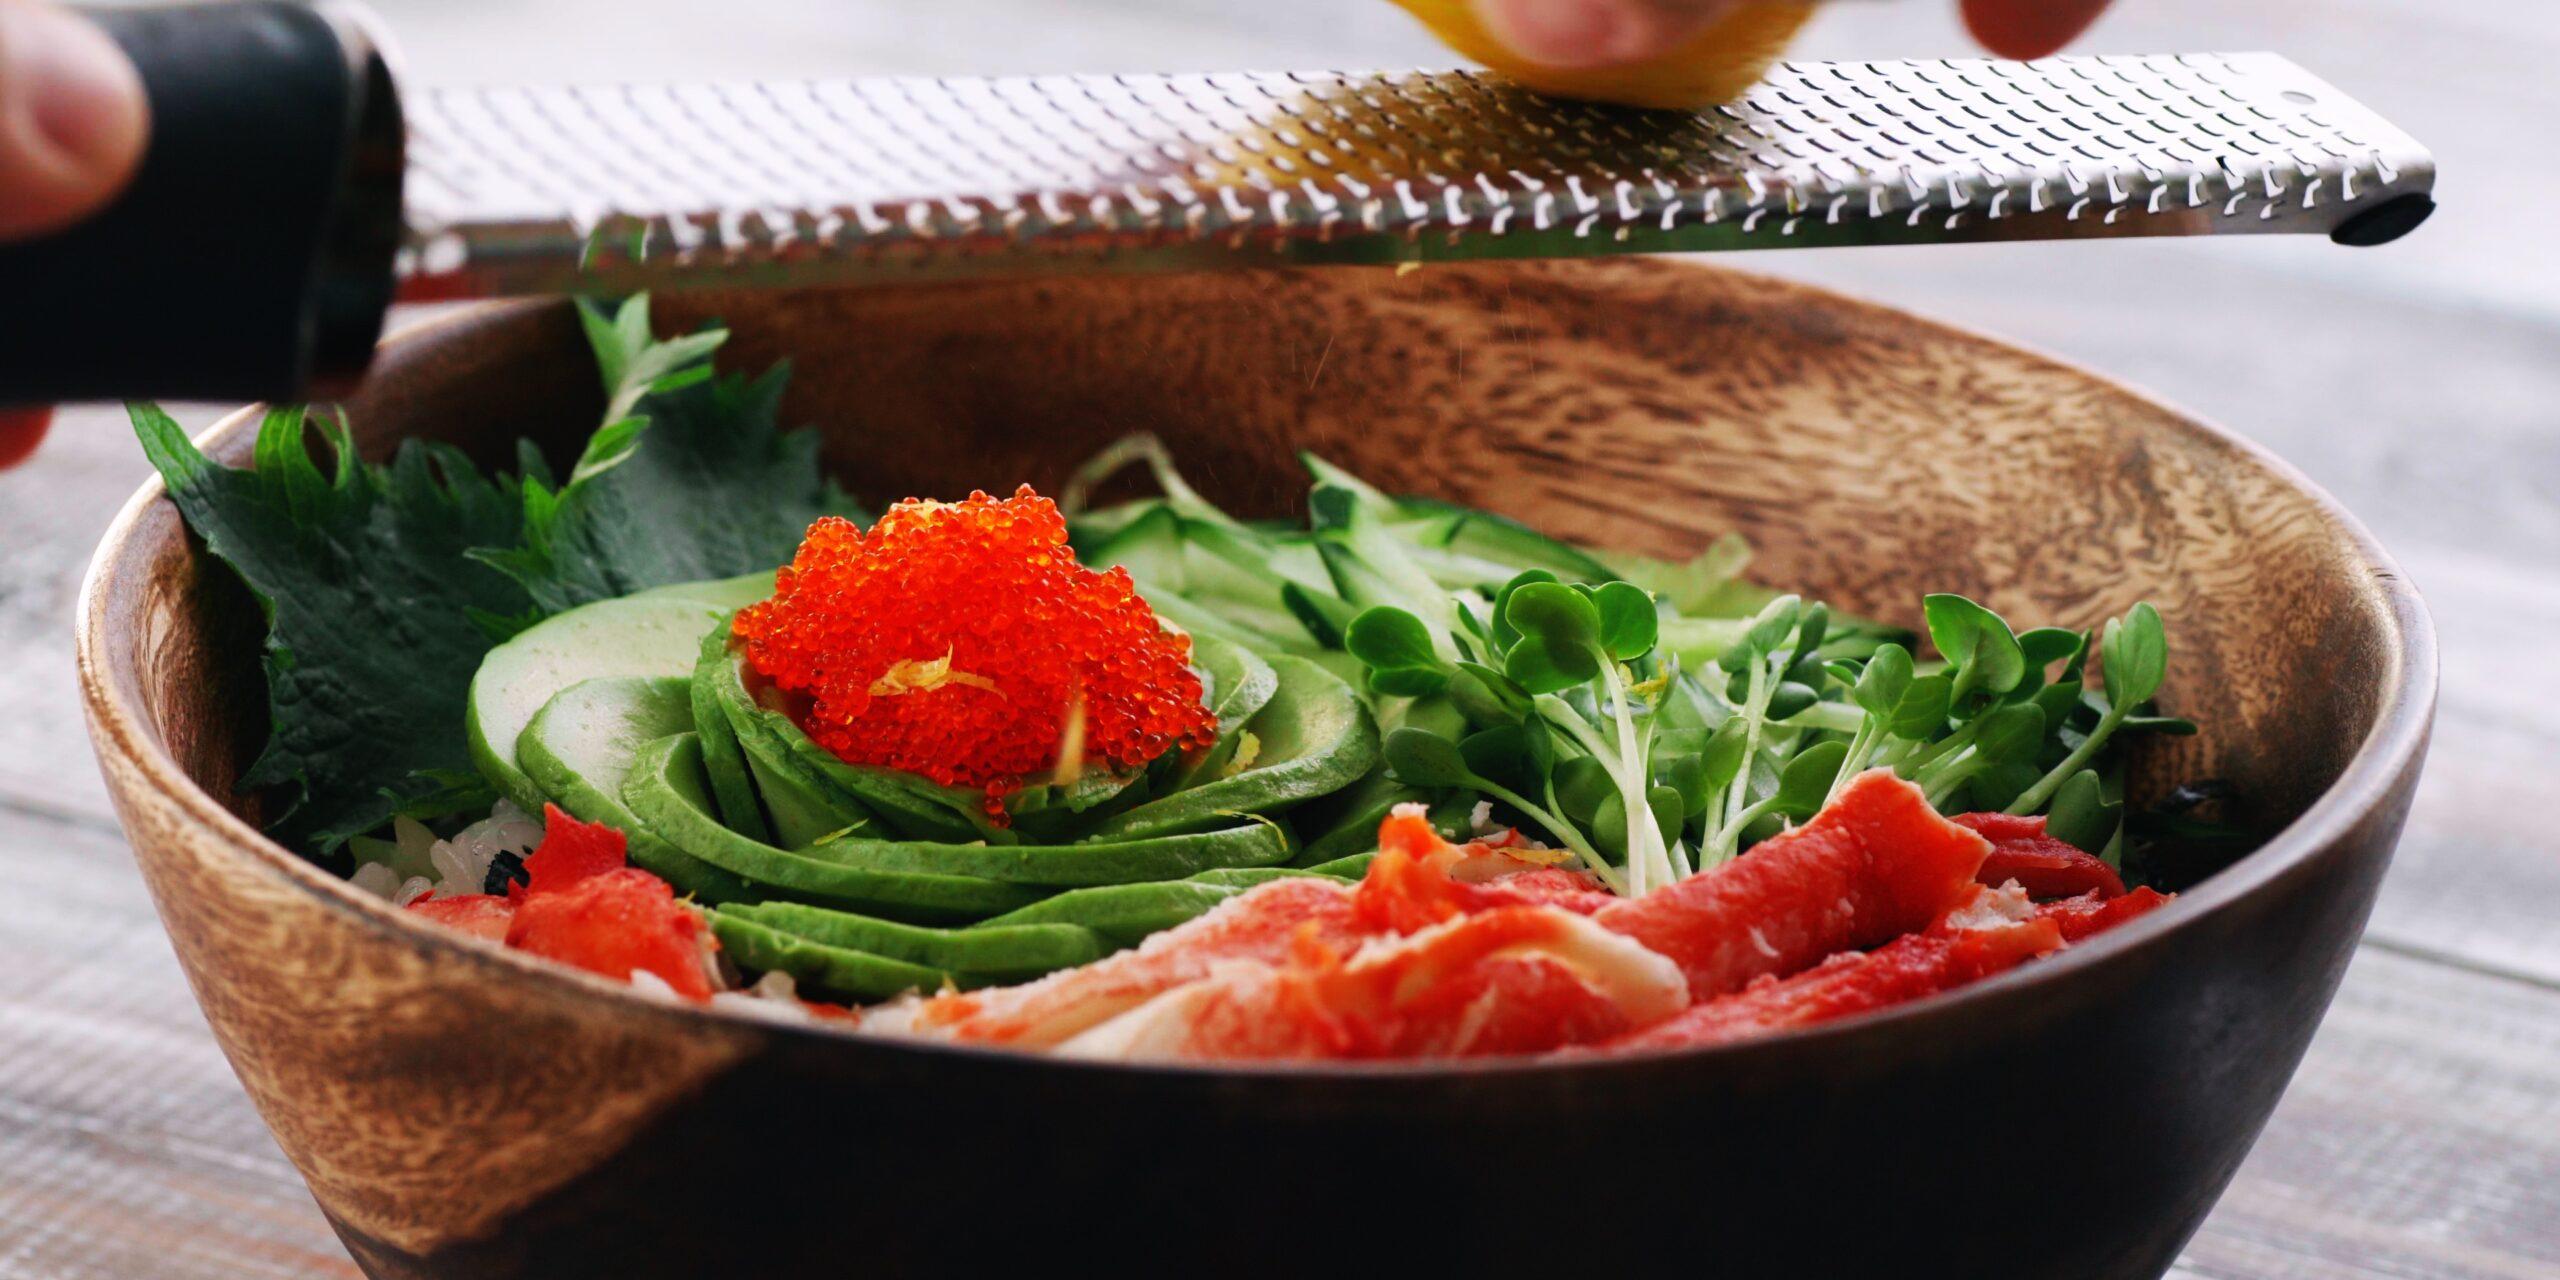 Grating yuzu zest onto a California Roll sushi bowl.